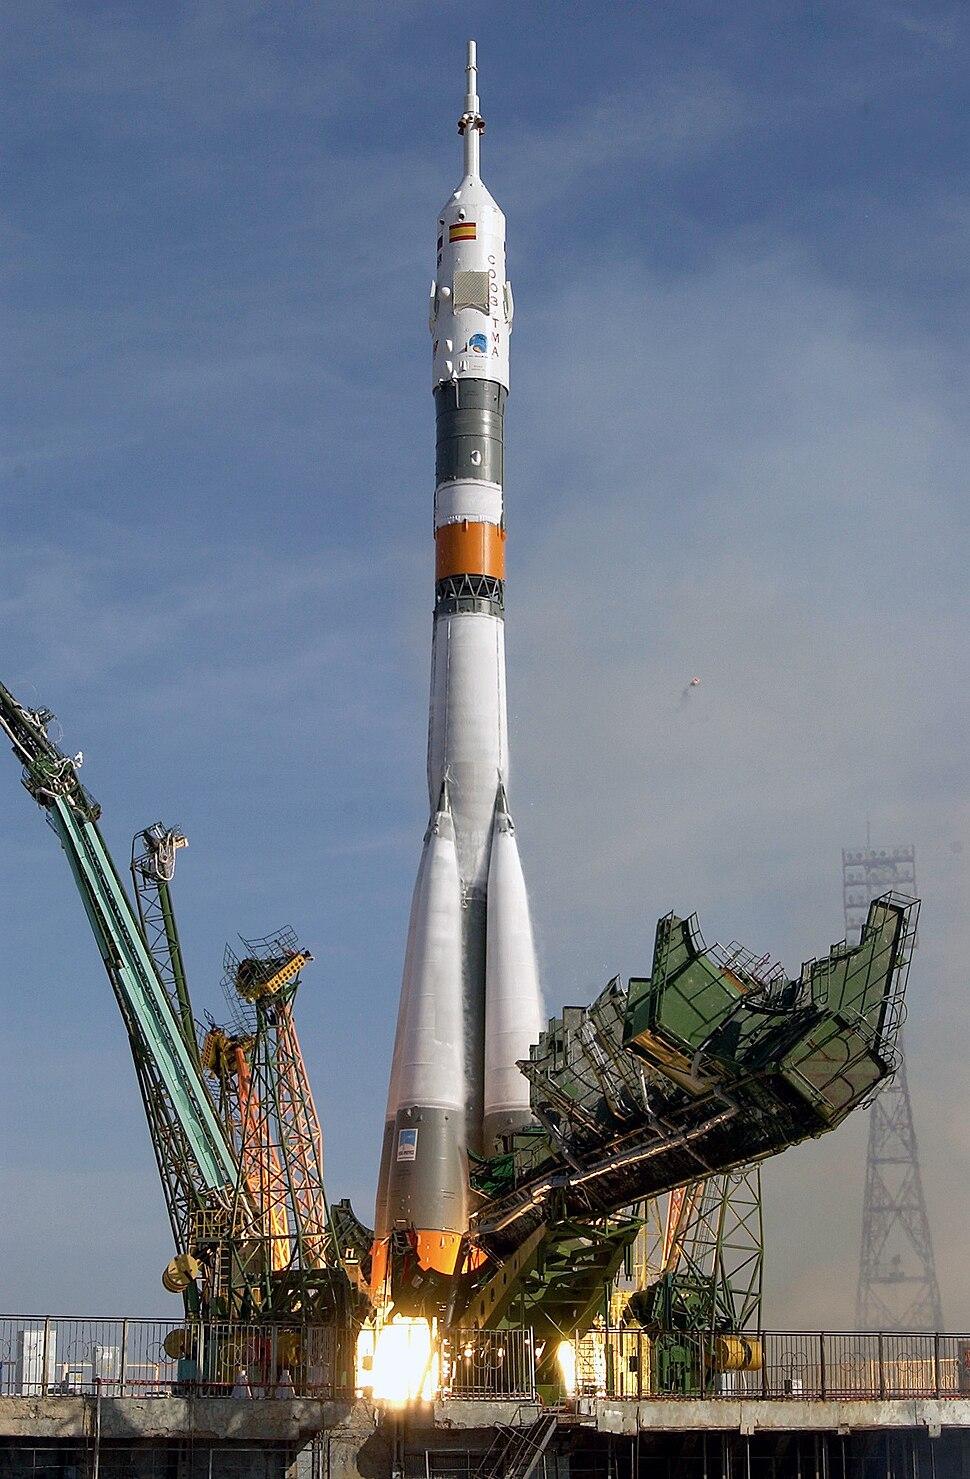 Soyuz TMA-3 launch